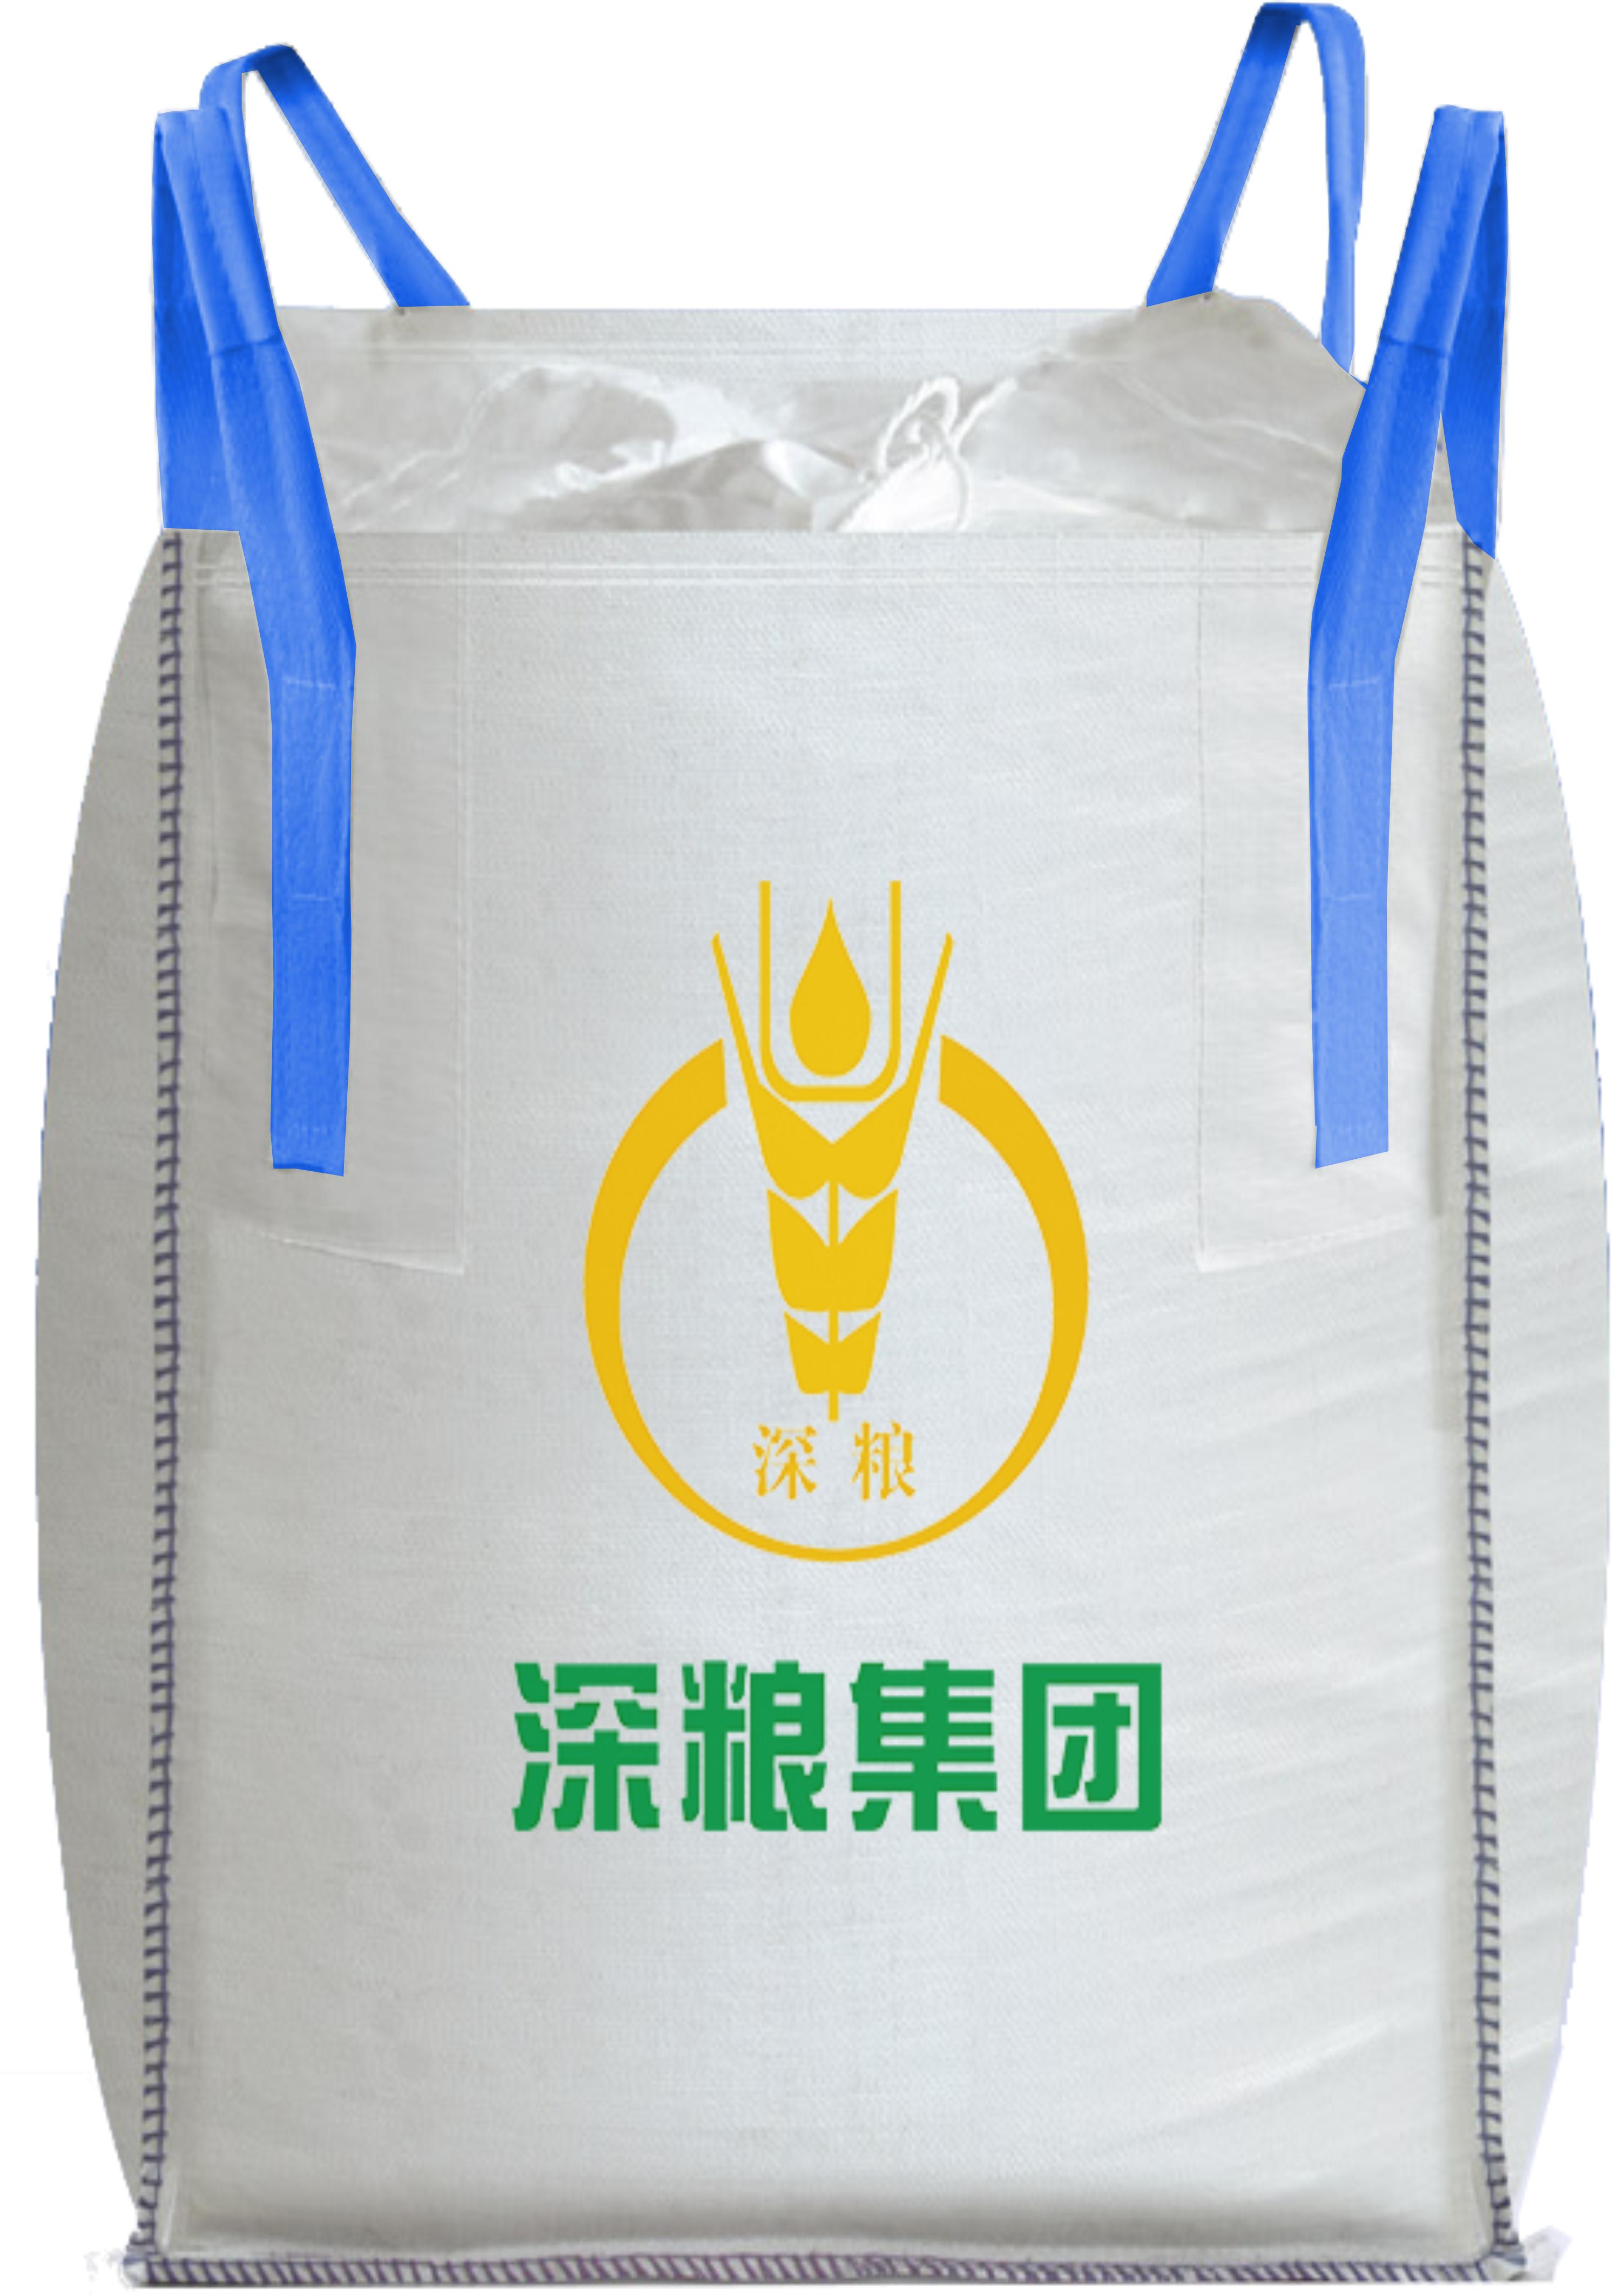 Food-grade Jumbo bags